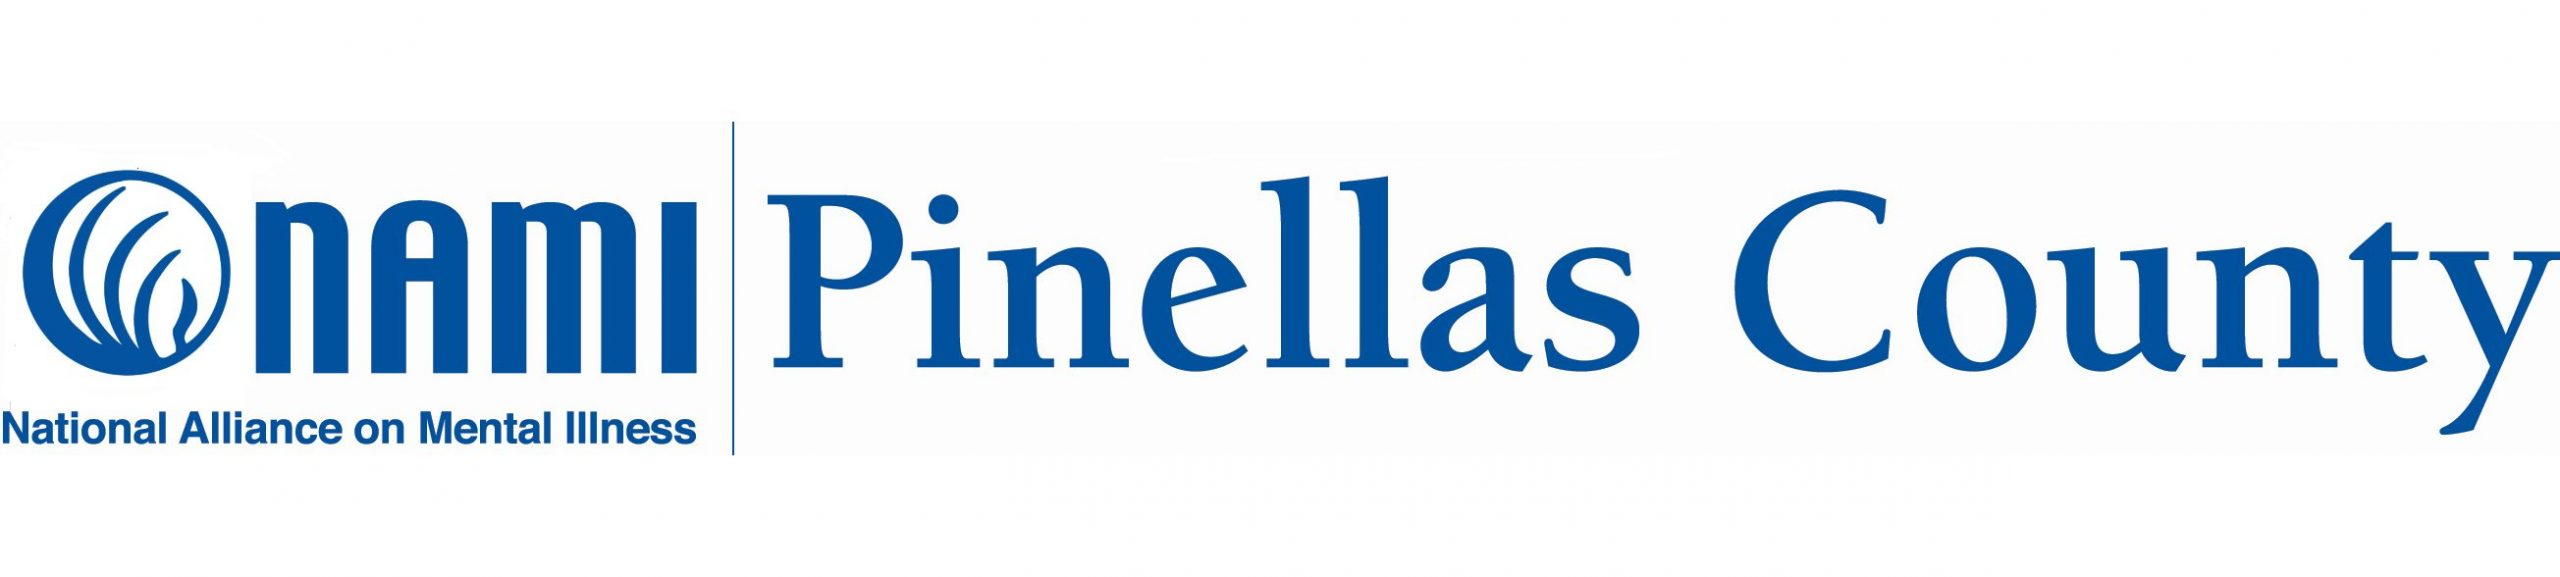 NAMI Pinellas County Logo